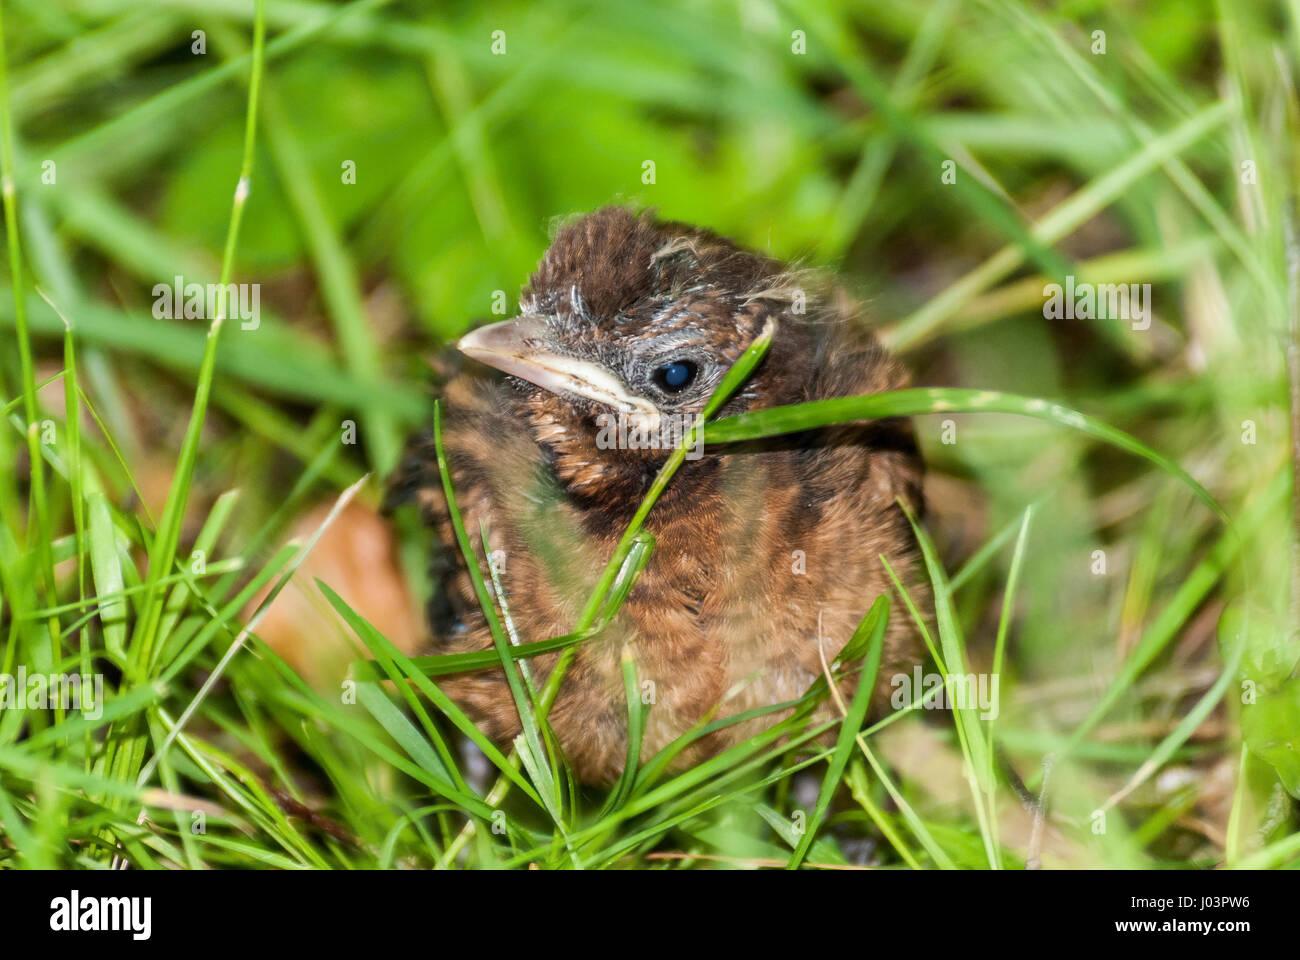 Baby Blackbird chick in grass. - Stock Image